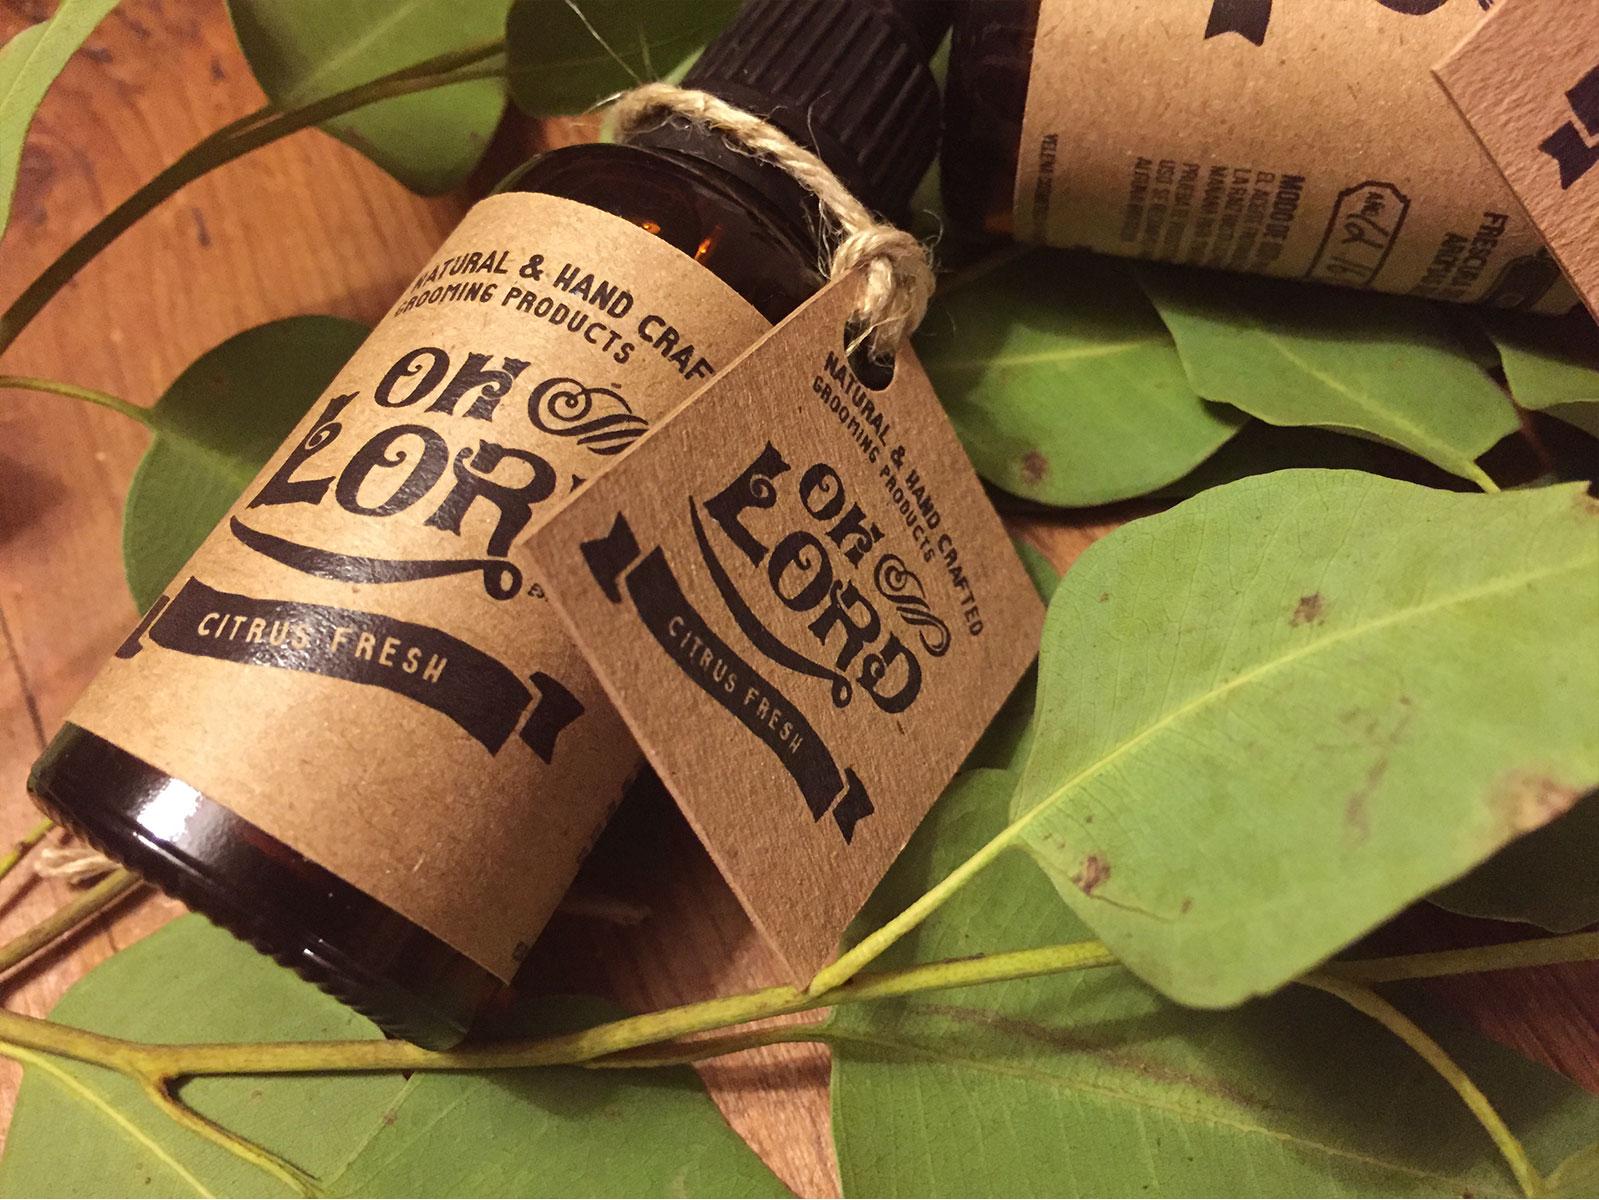 OhLord-Beard-Oils-design-8